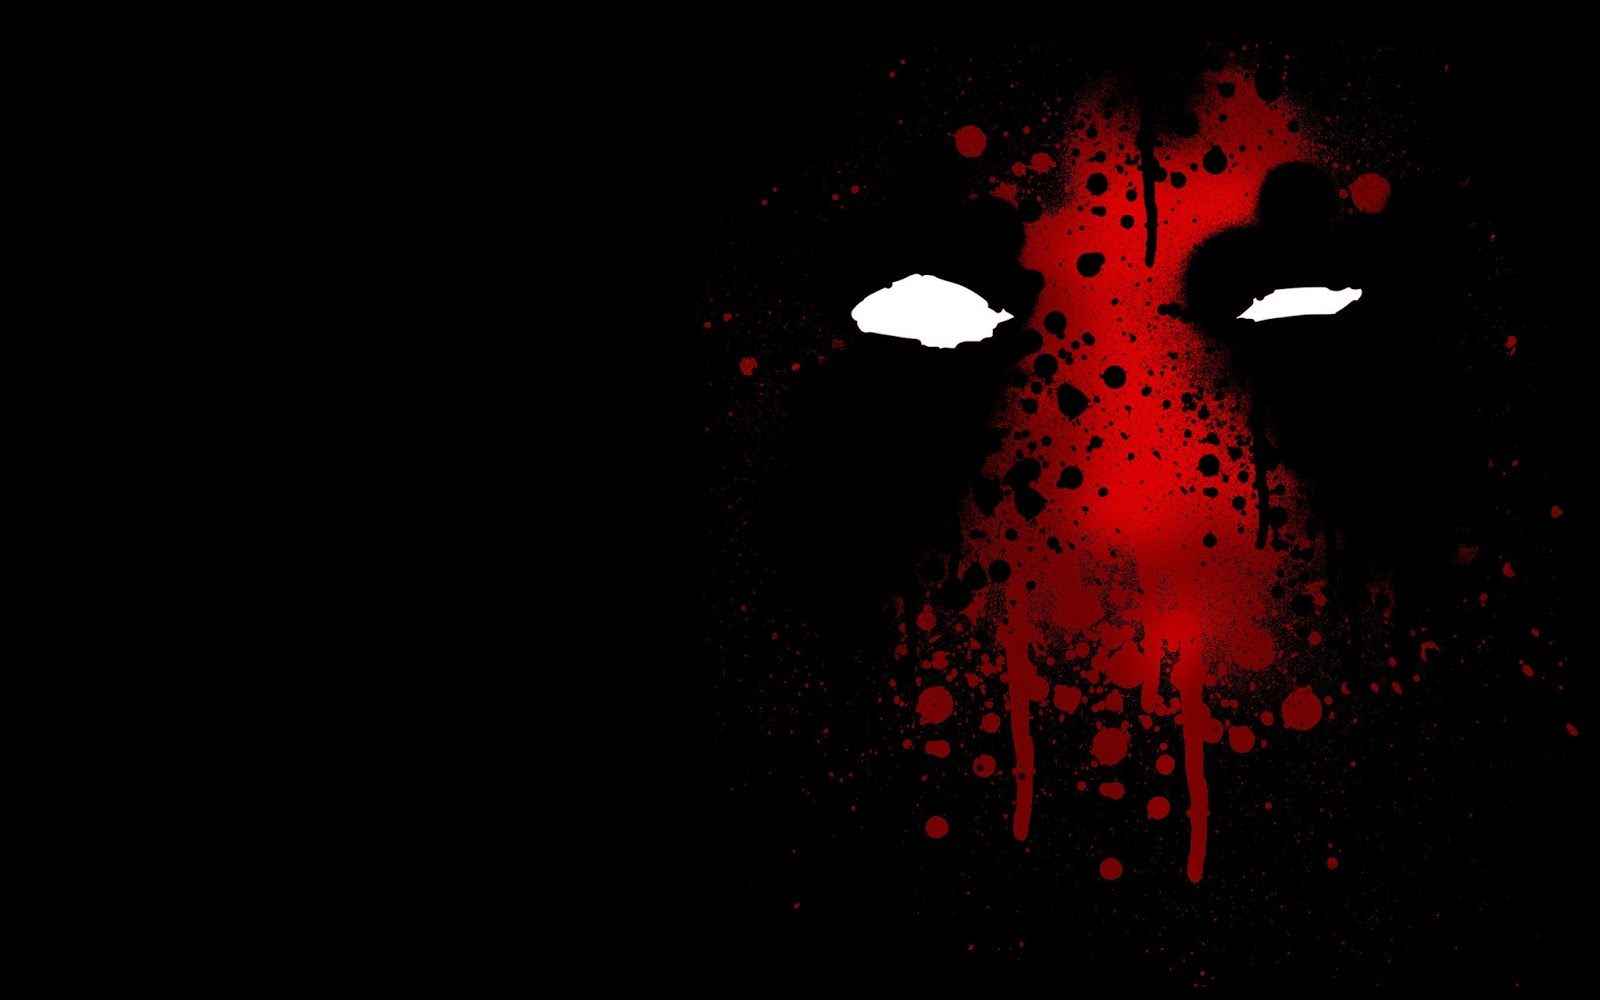 Marvel Heroes Superhero Black Dark Background HD Wallpaper Desktop 1600x1000